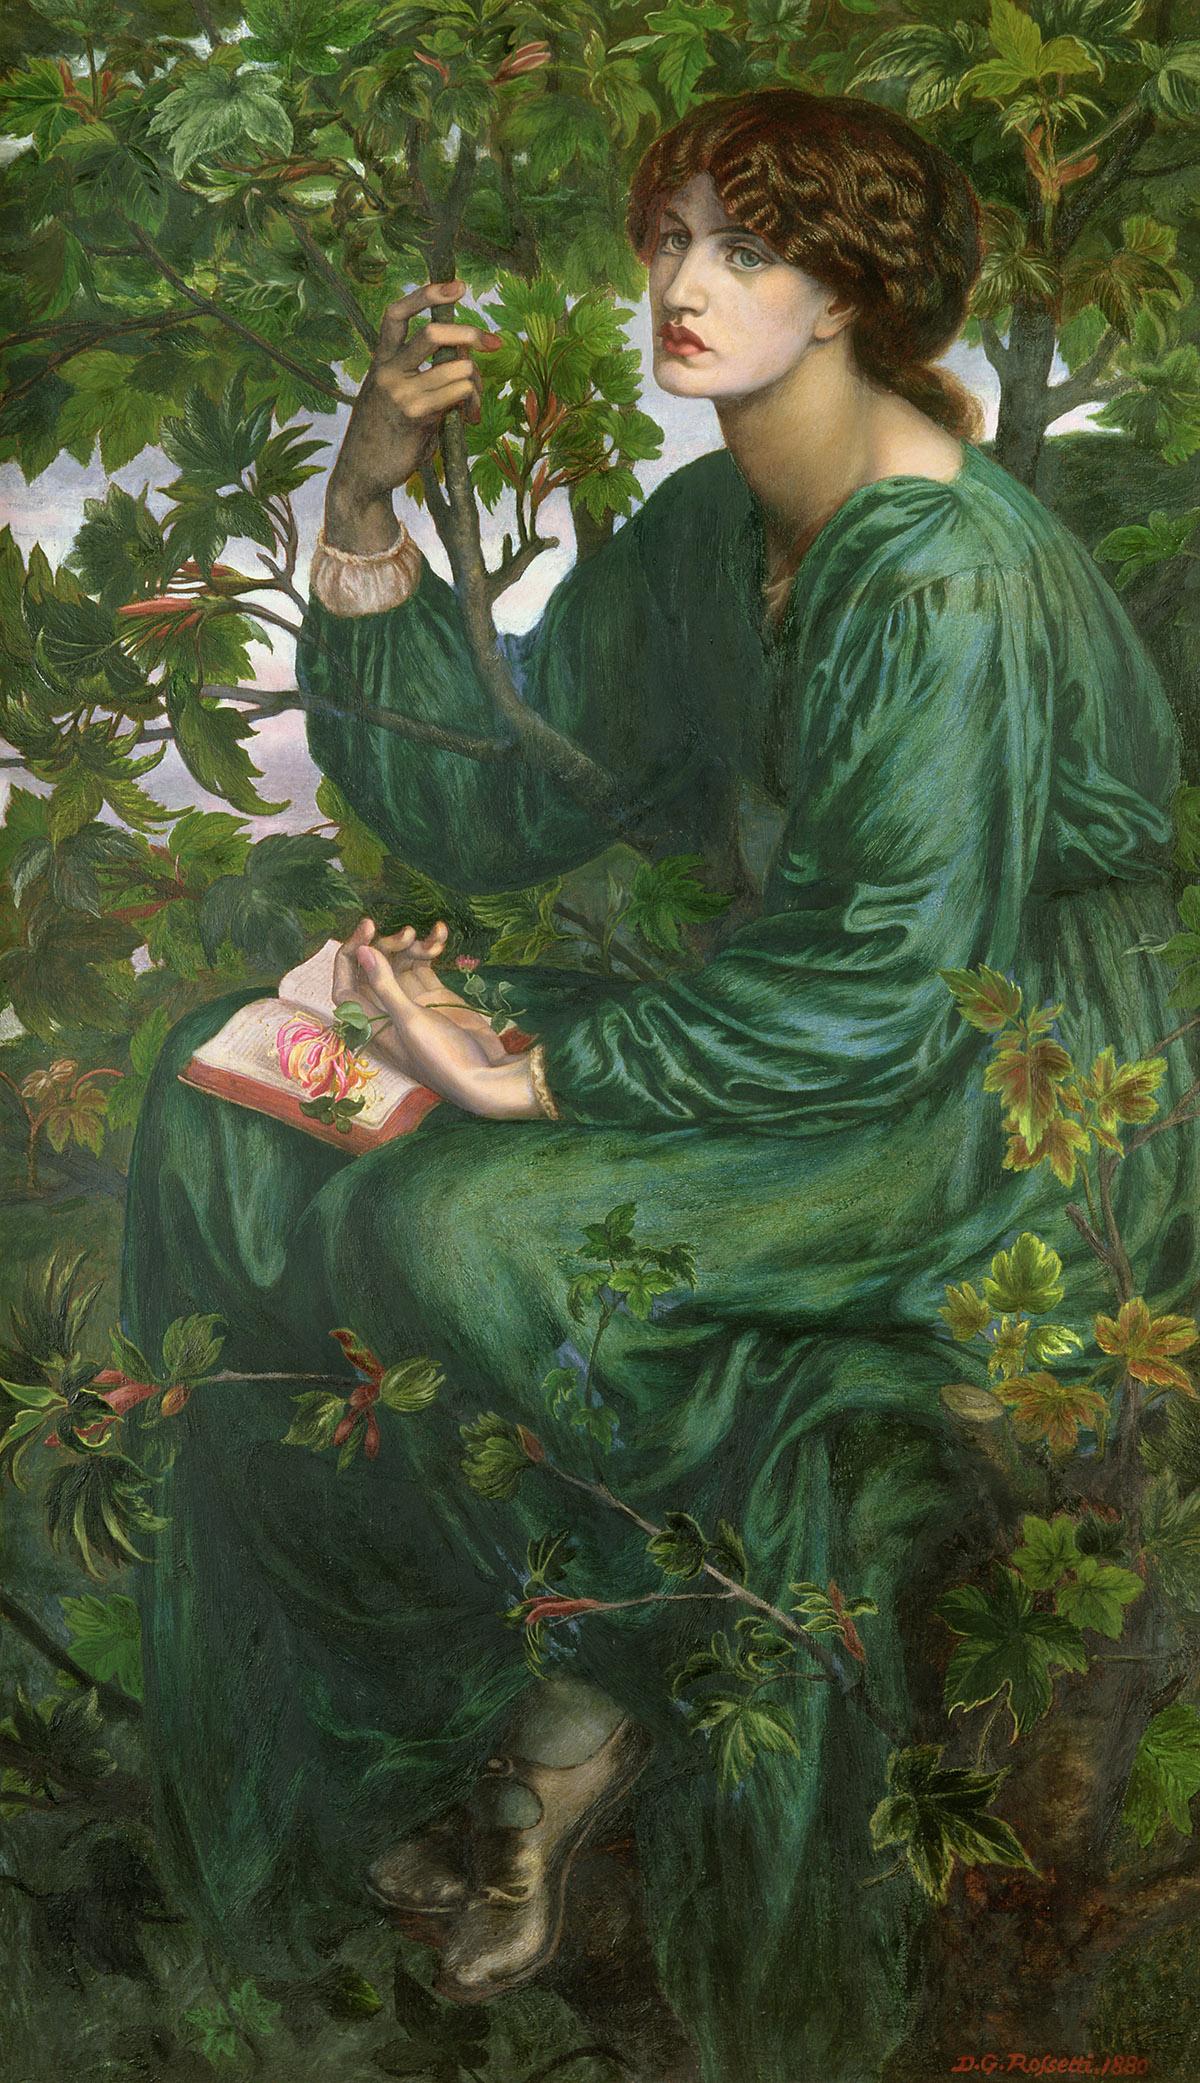 Image Credit: Day Dream, 1880 (oil on canvas), Dante Gabriel Rossetti (1828-82) / Victoria & Albert Museum, London, UK / Bridgeman Images